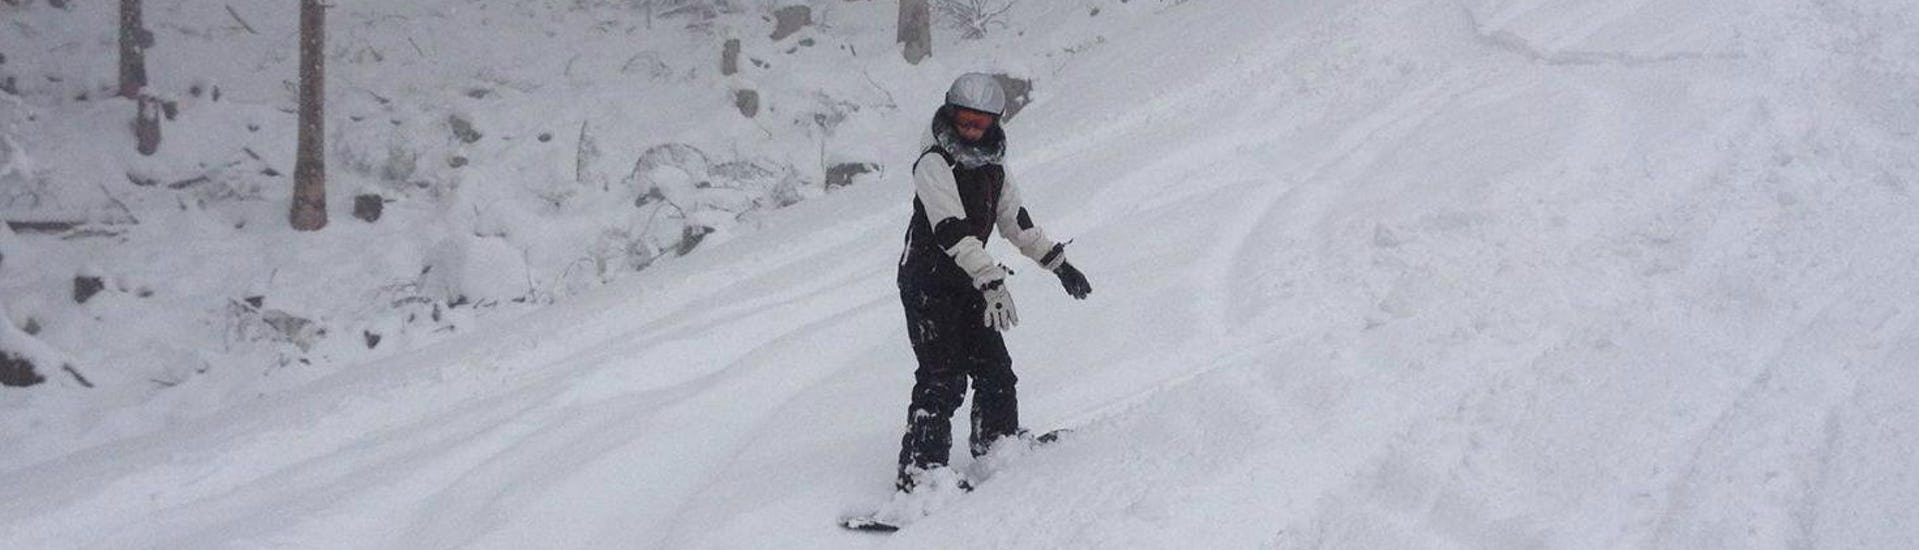 Privélessen snowboarden - Alle leeftijden en niveaus